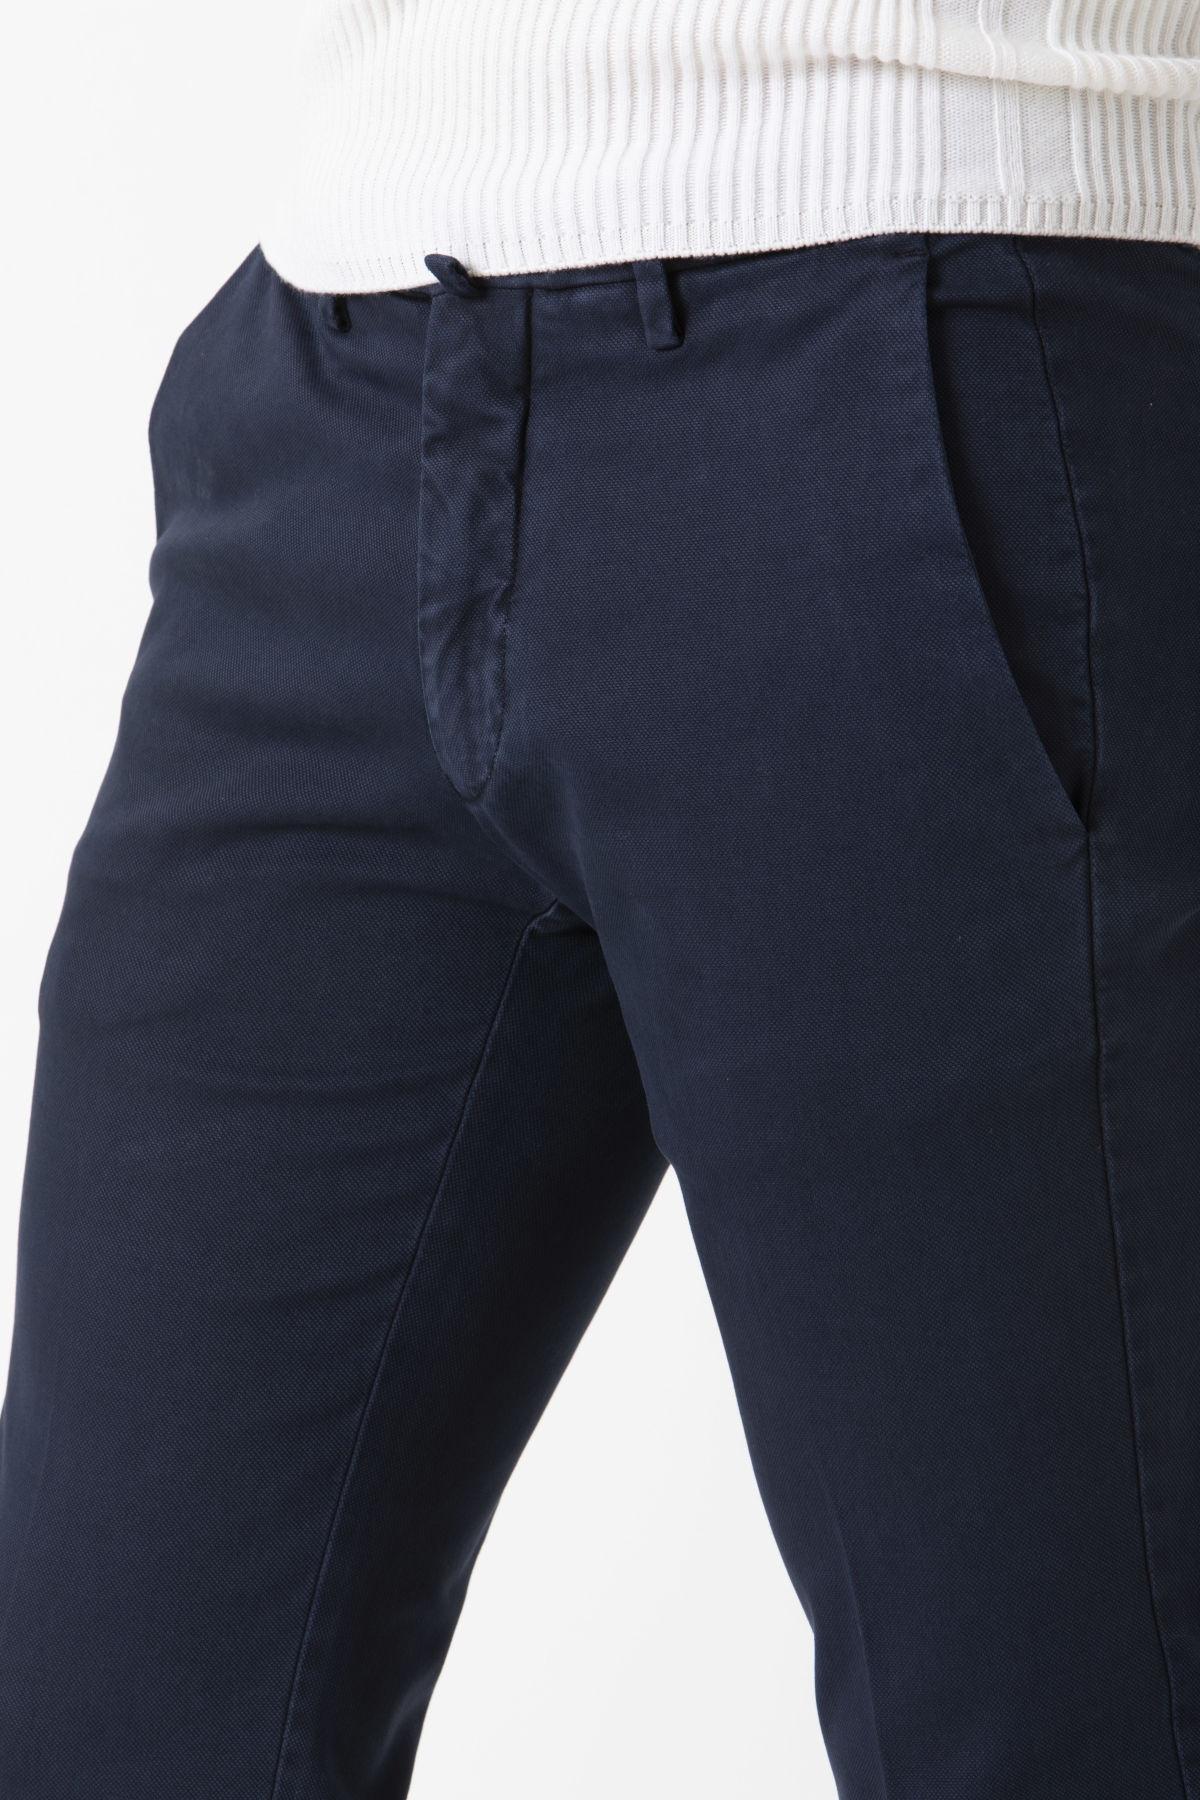 Pantaloni RICKY per uomo ENTRE AMIS A/I 19-20